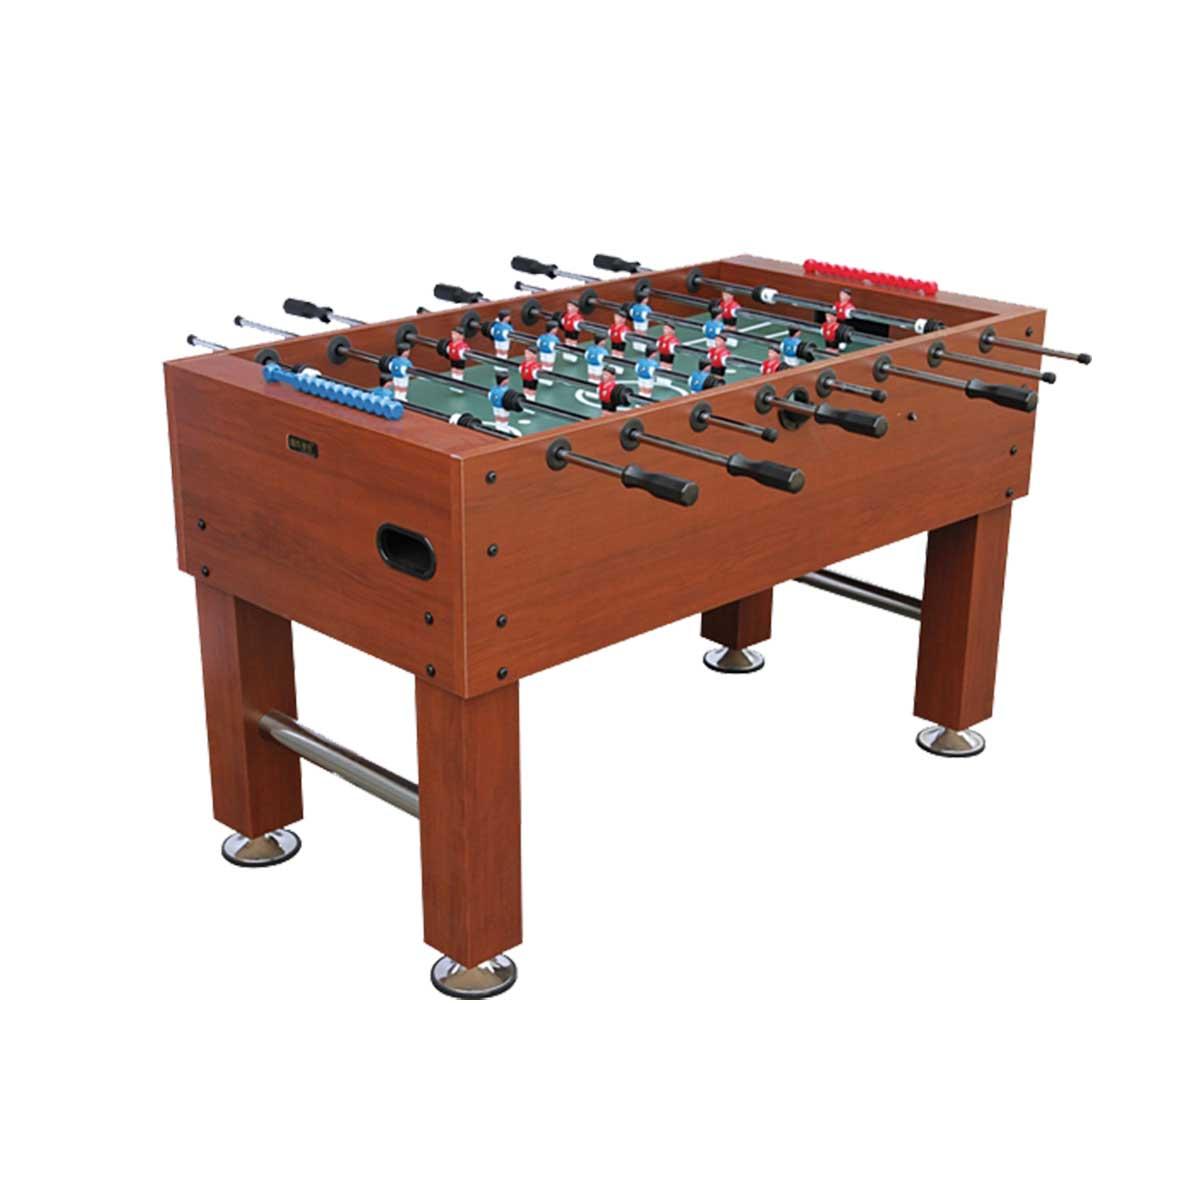 Foosball Tables, Foosball, Leisure Sports, Buy, Imported, Wood Finish Foosball  Table (SBT 112)